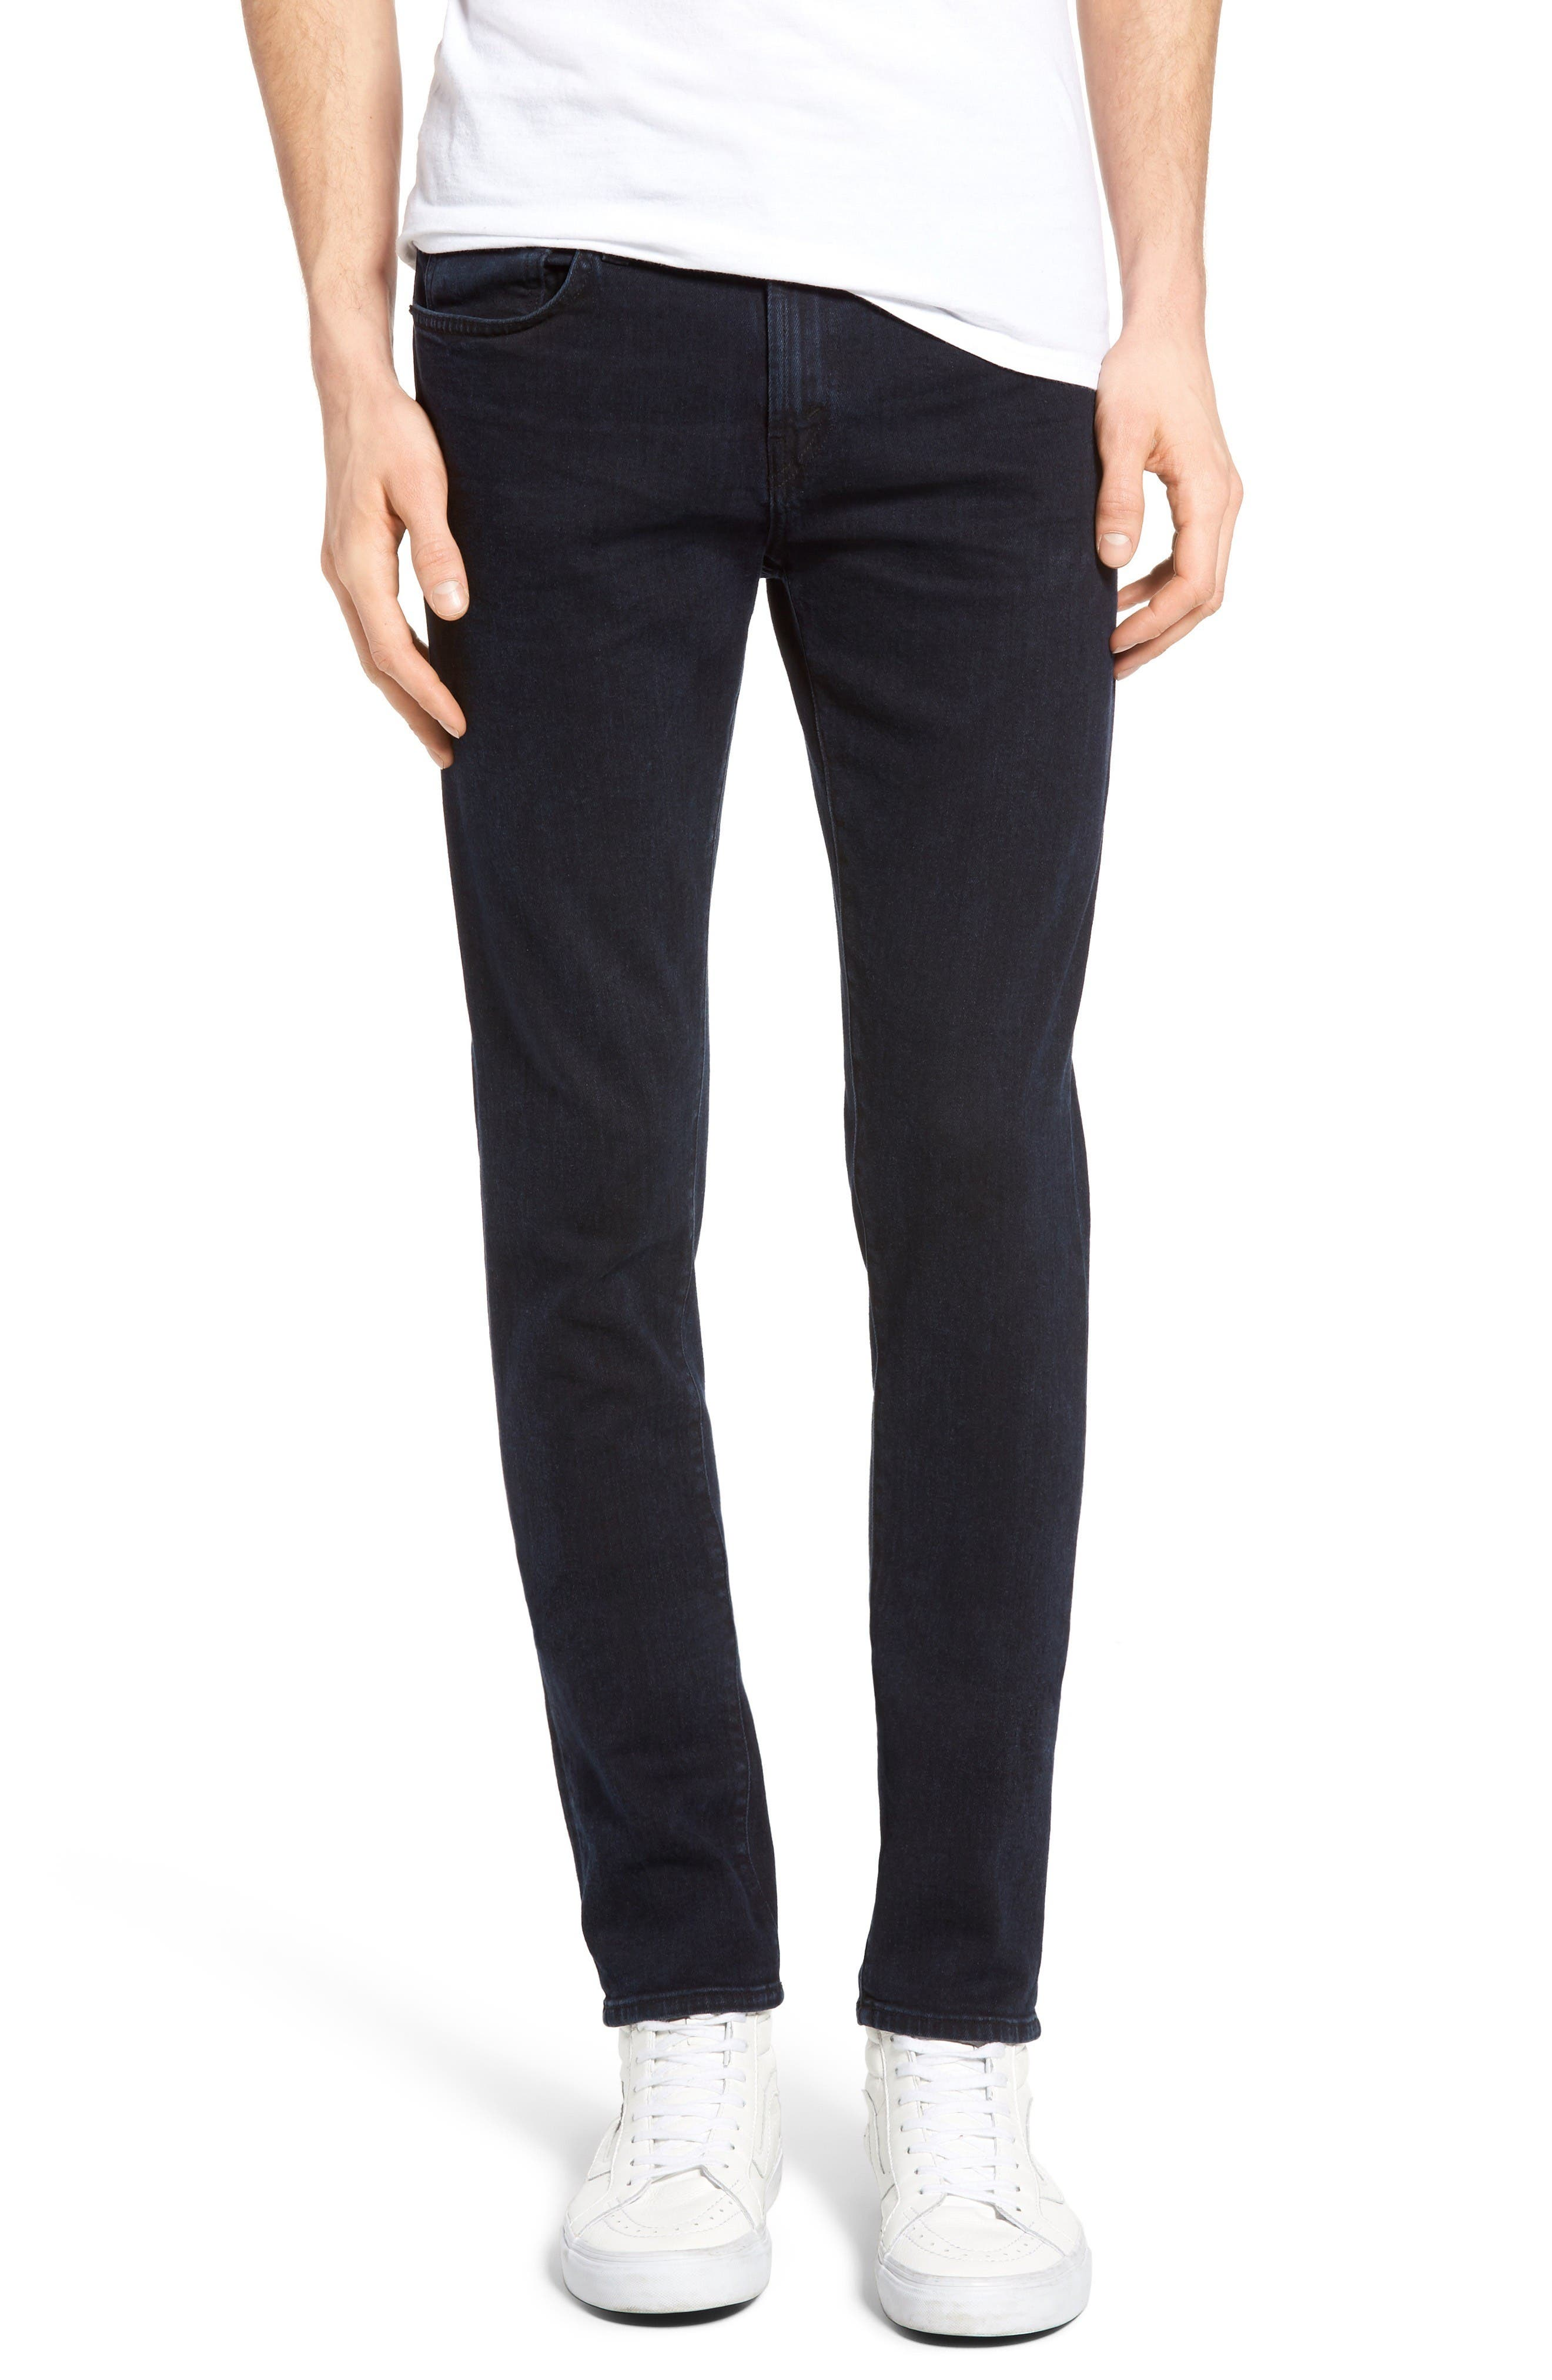 Main Image - J Brand Skinny Fit Jeans (Caput)